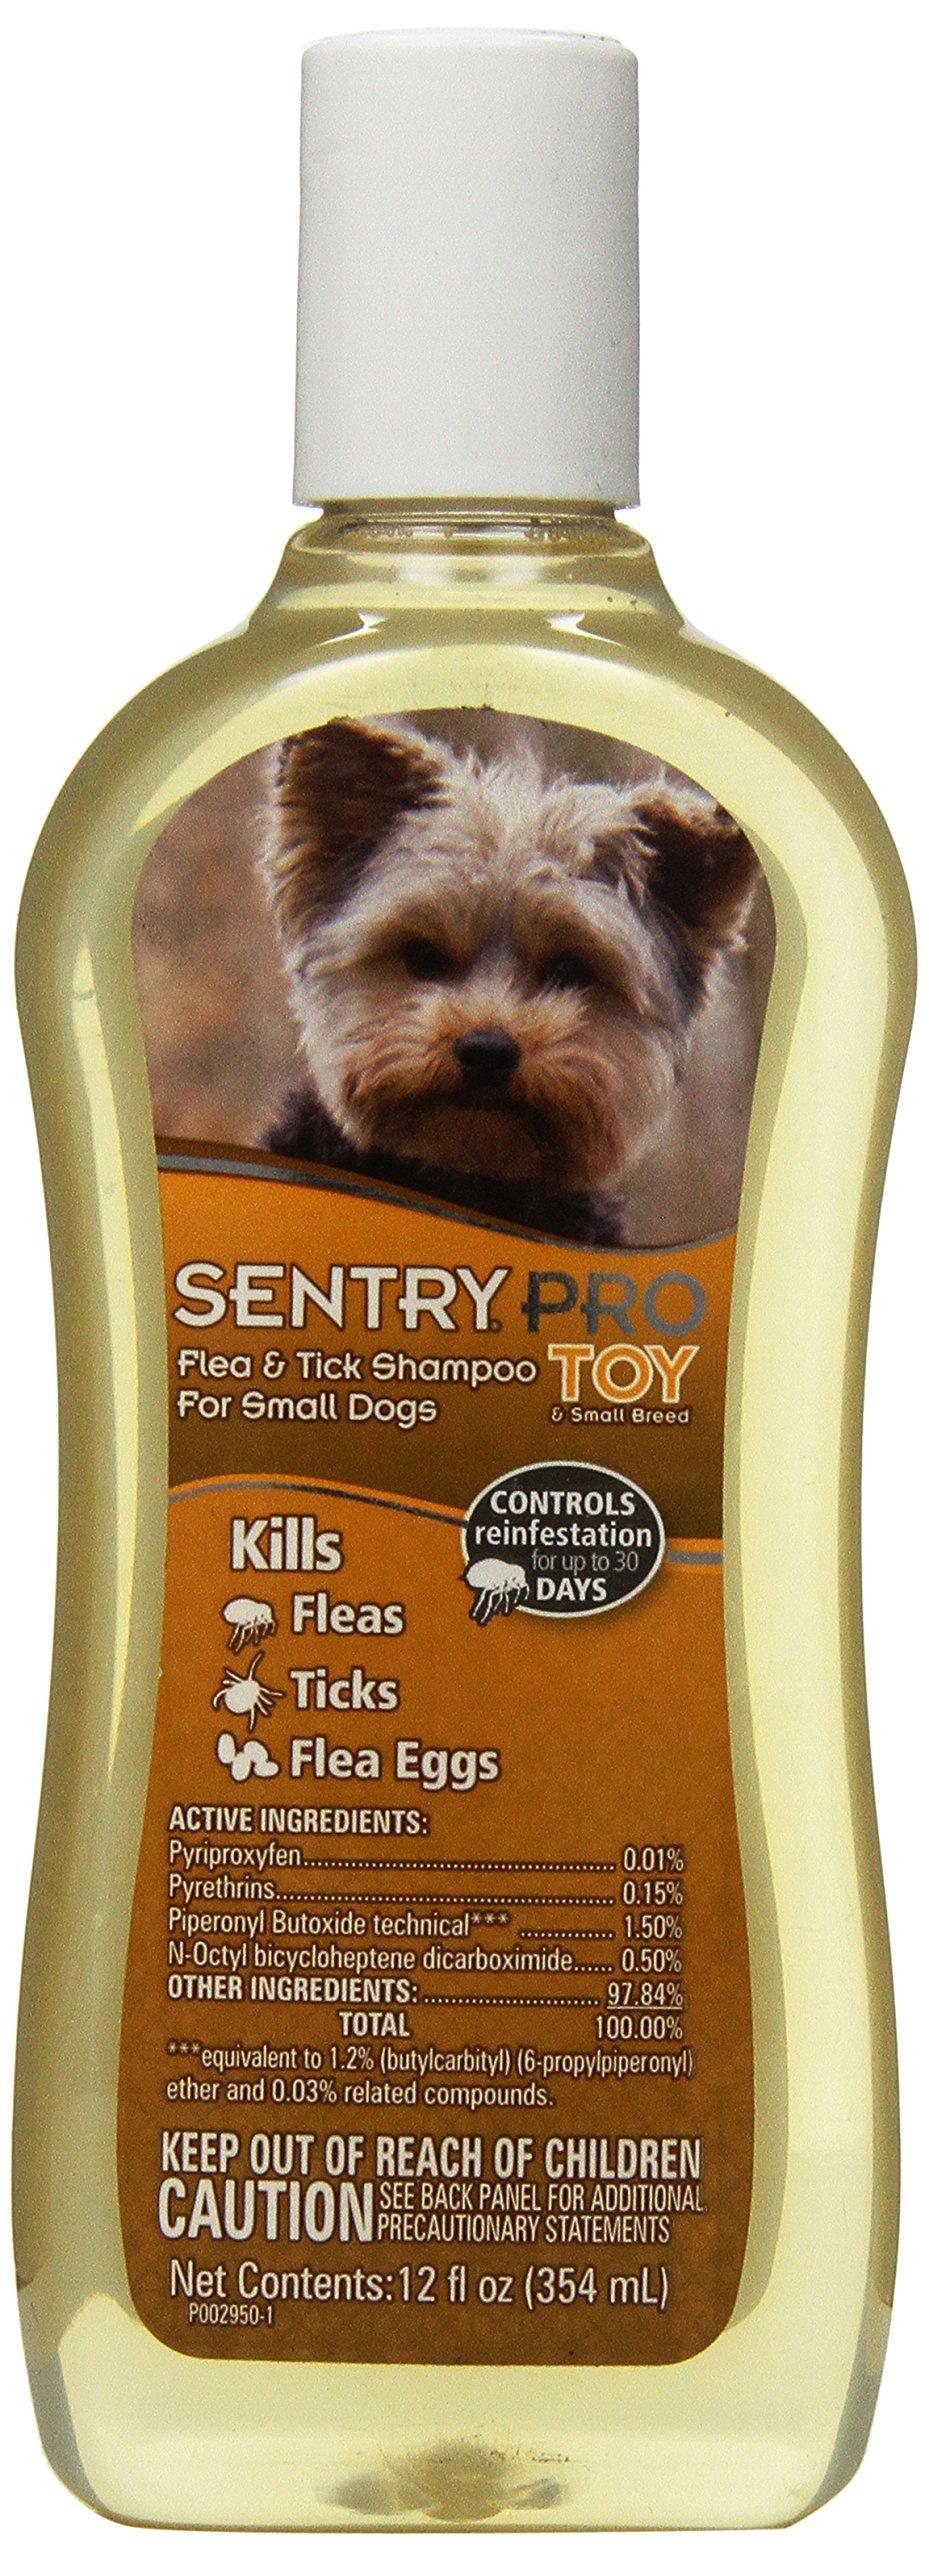 SENTRY PRO Toy Breed Flea and Tick Shampoo, 12 oz